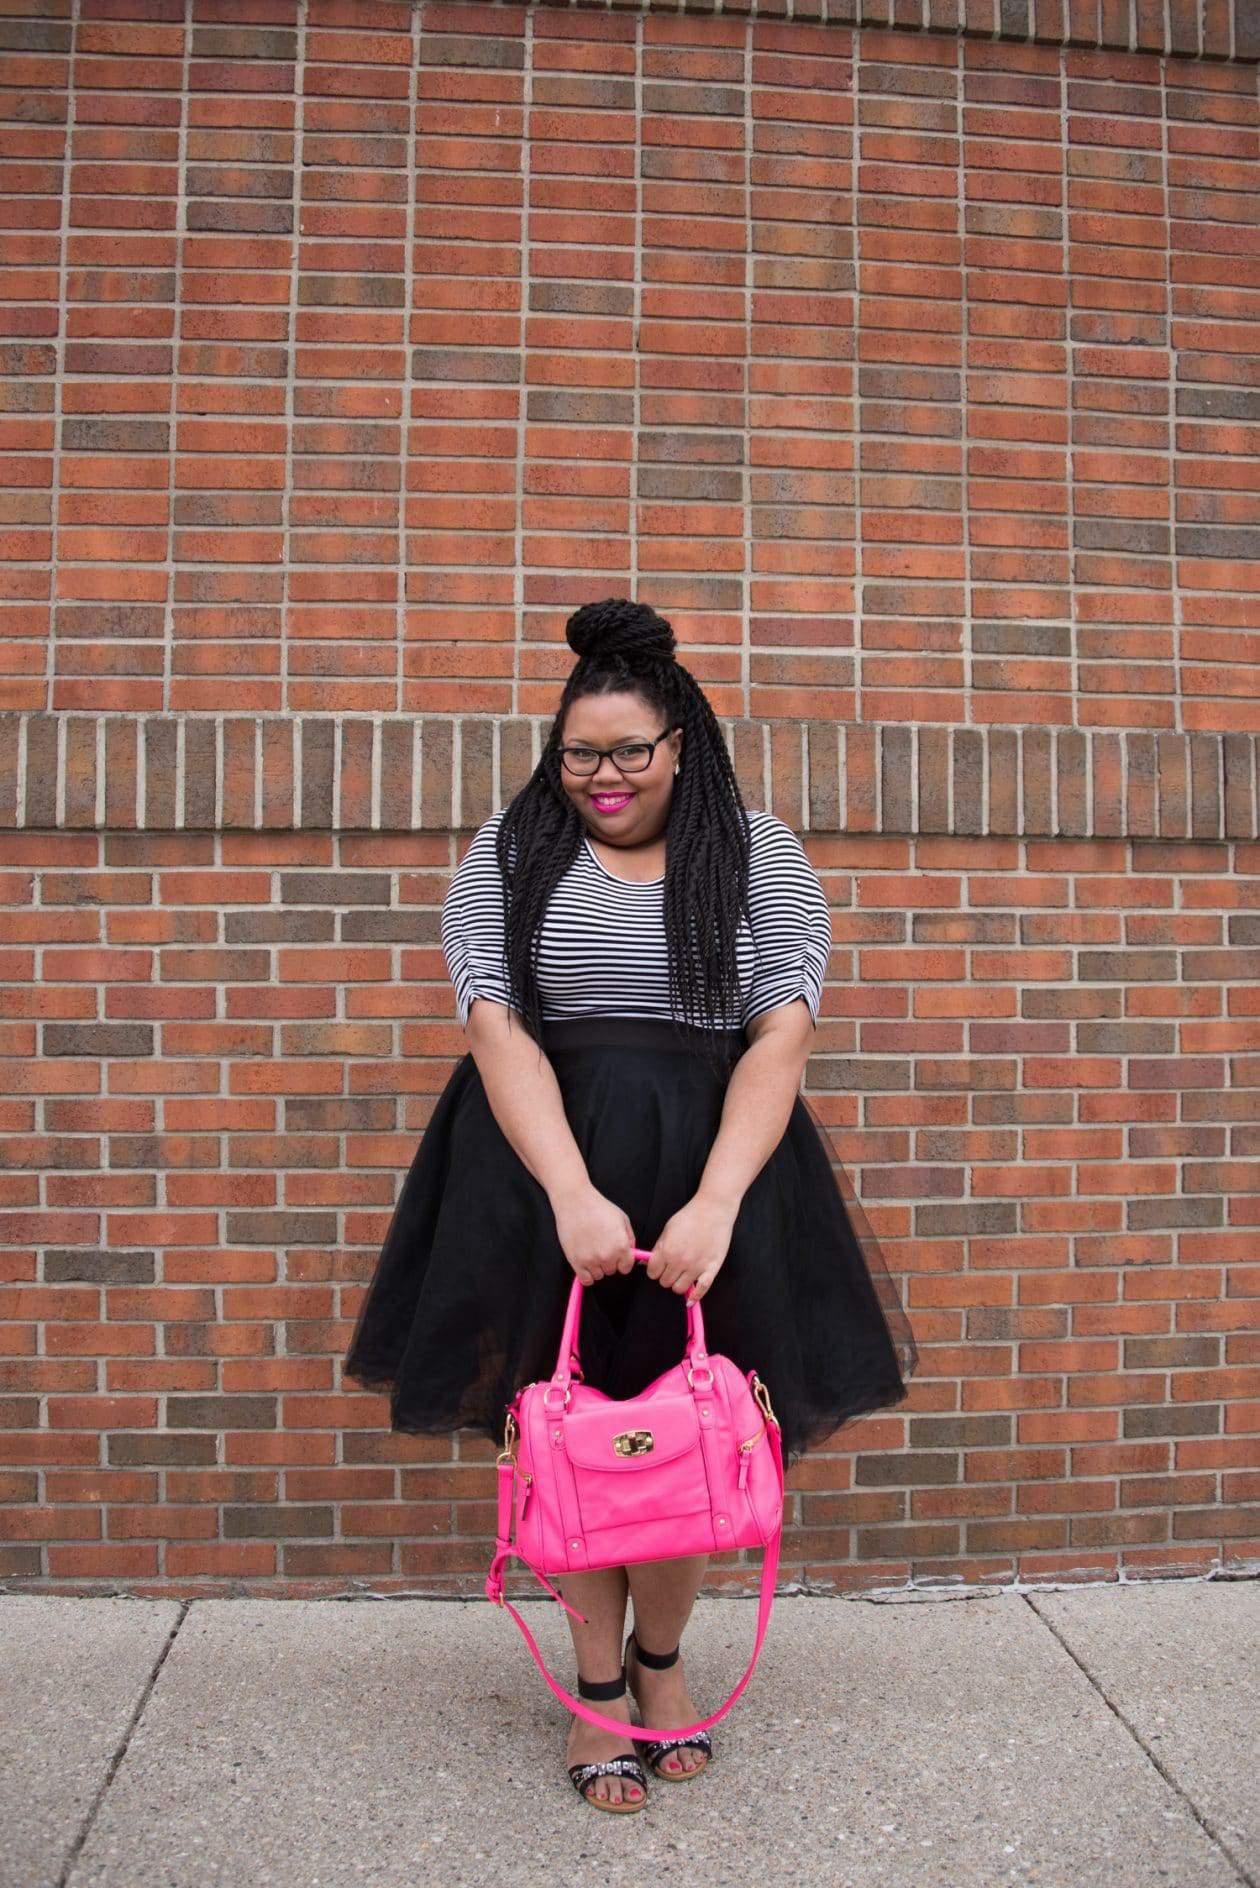 Meet Plus Size Fashion Blogger, Sierra of Eclectic Kurves